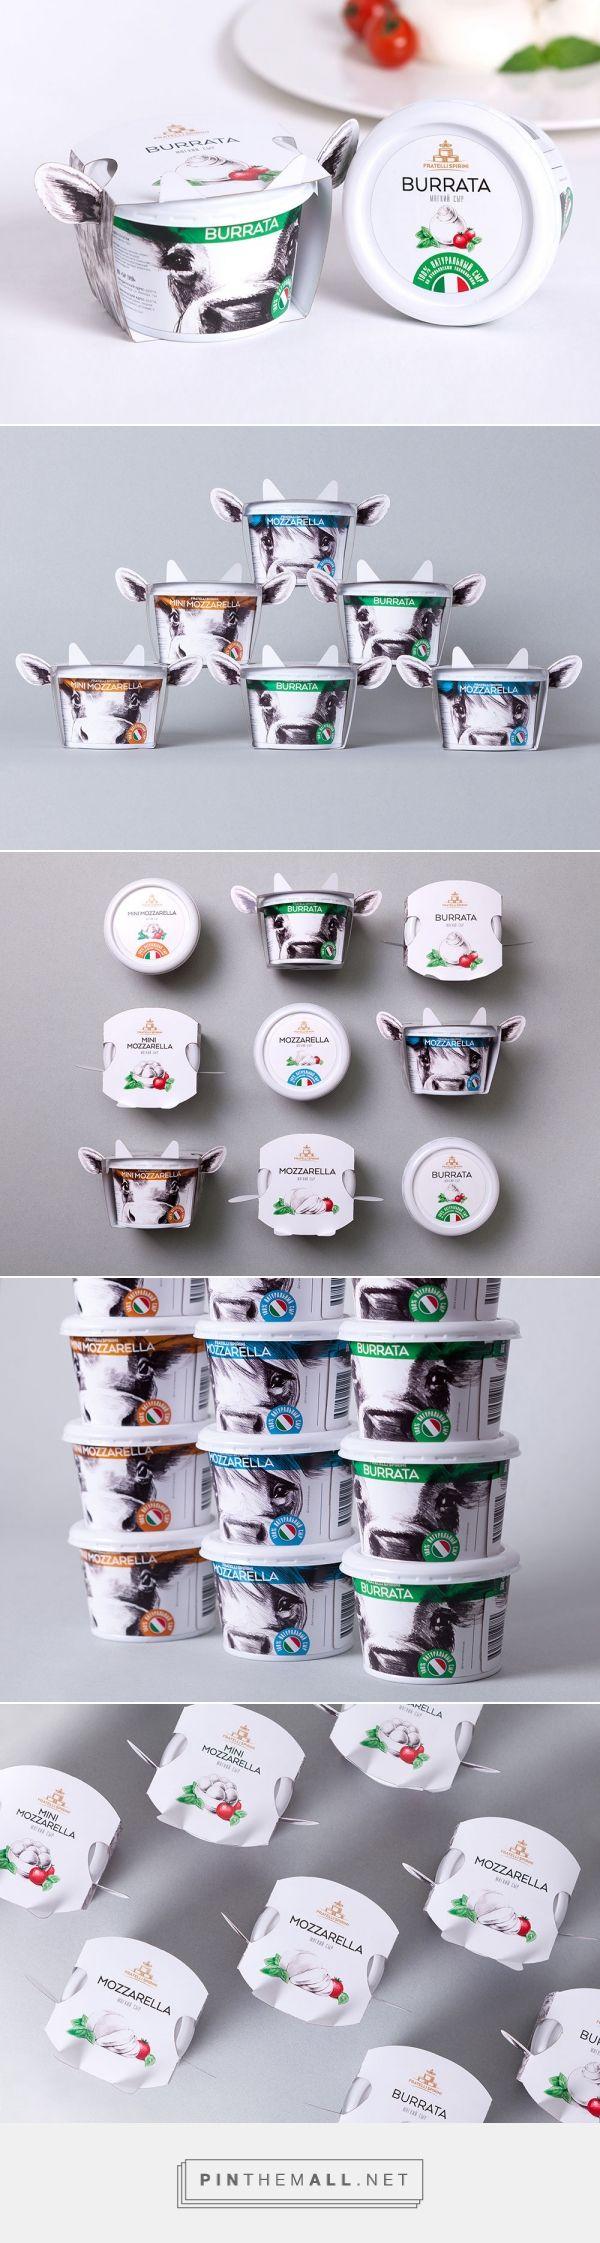 GORDOST - Fratelli Spirini Soft Cheese packaging design blog World Packaging Design Society│Home of Packaging Design│Branding│Brand Design│CPG Design│FMCG Design - created via https://pinthemall.net